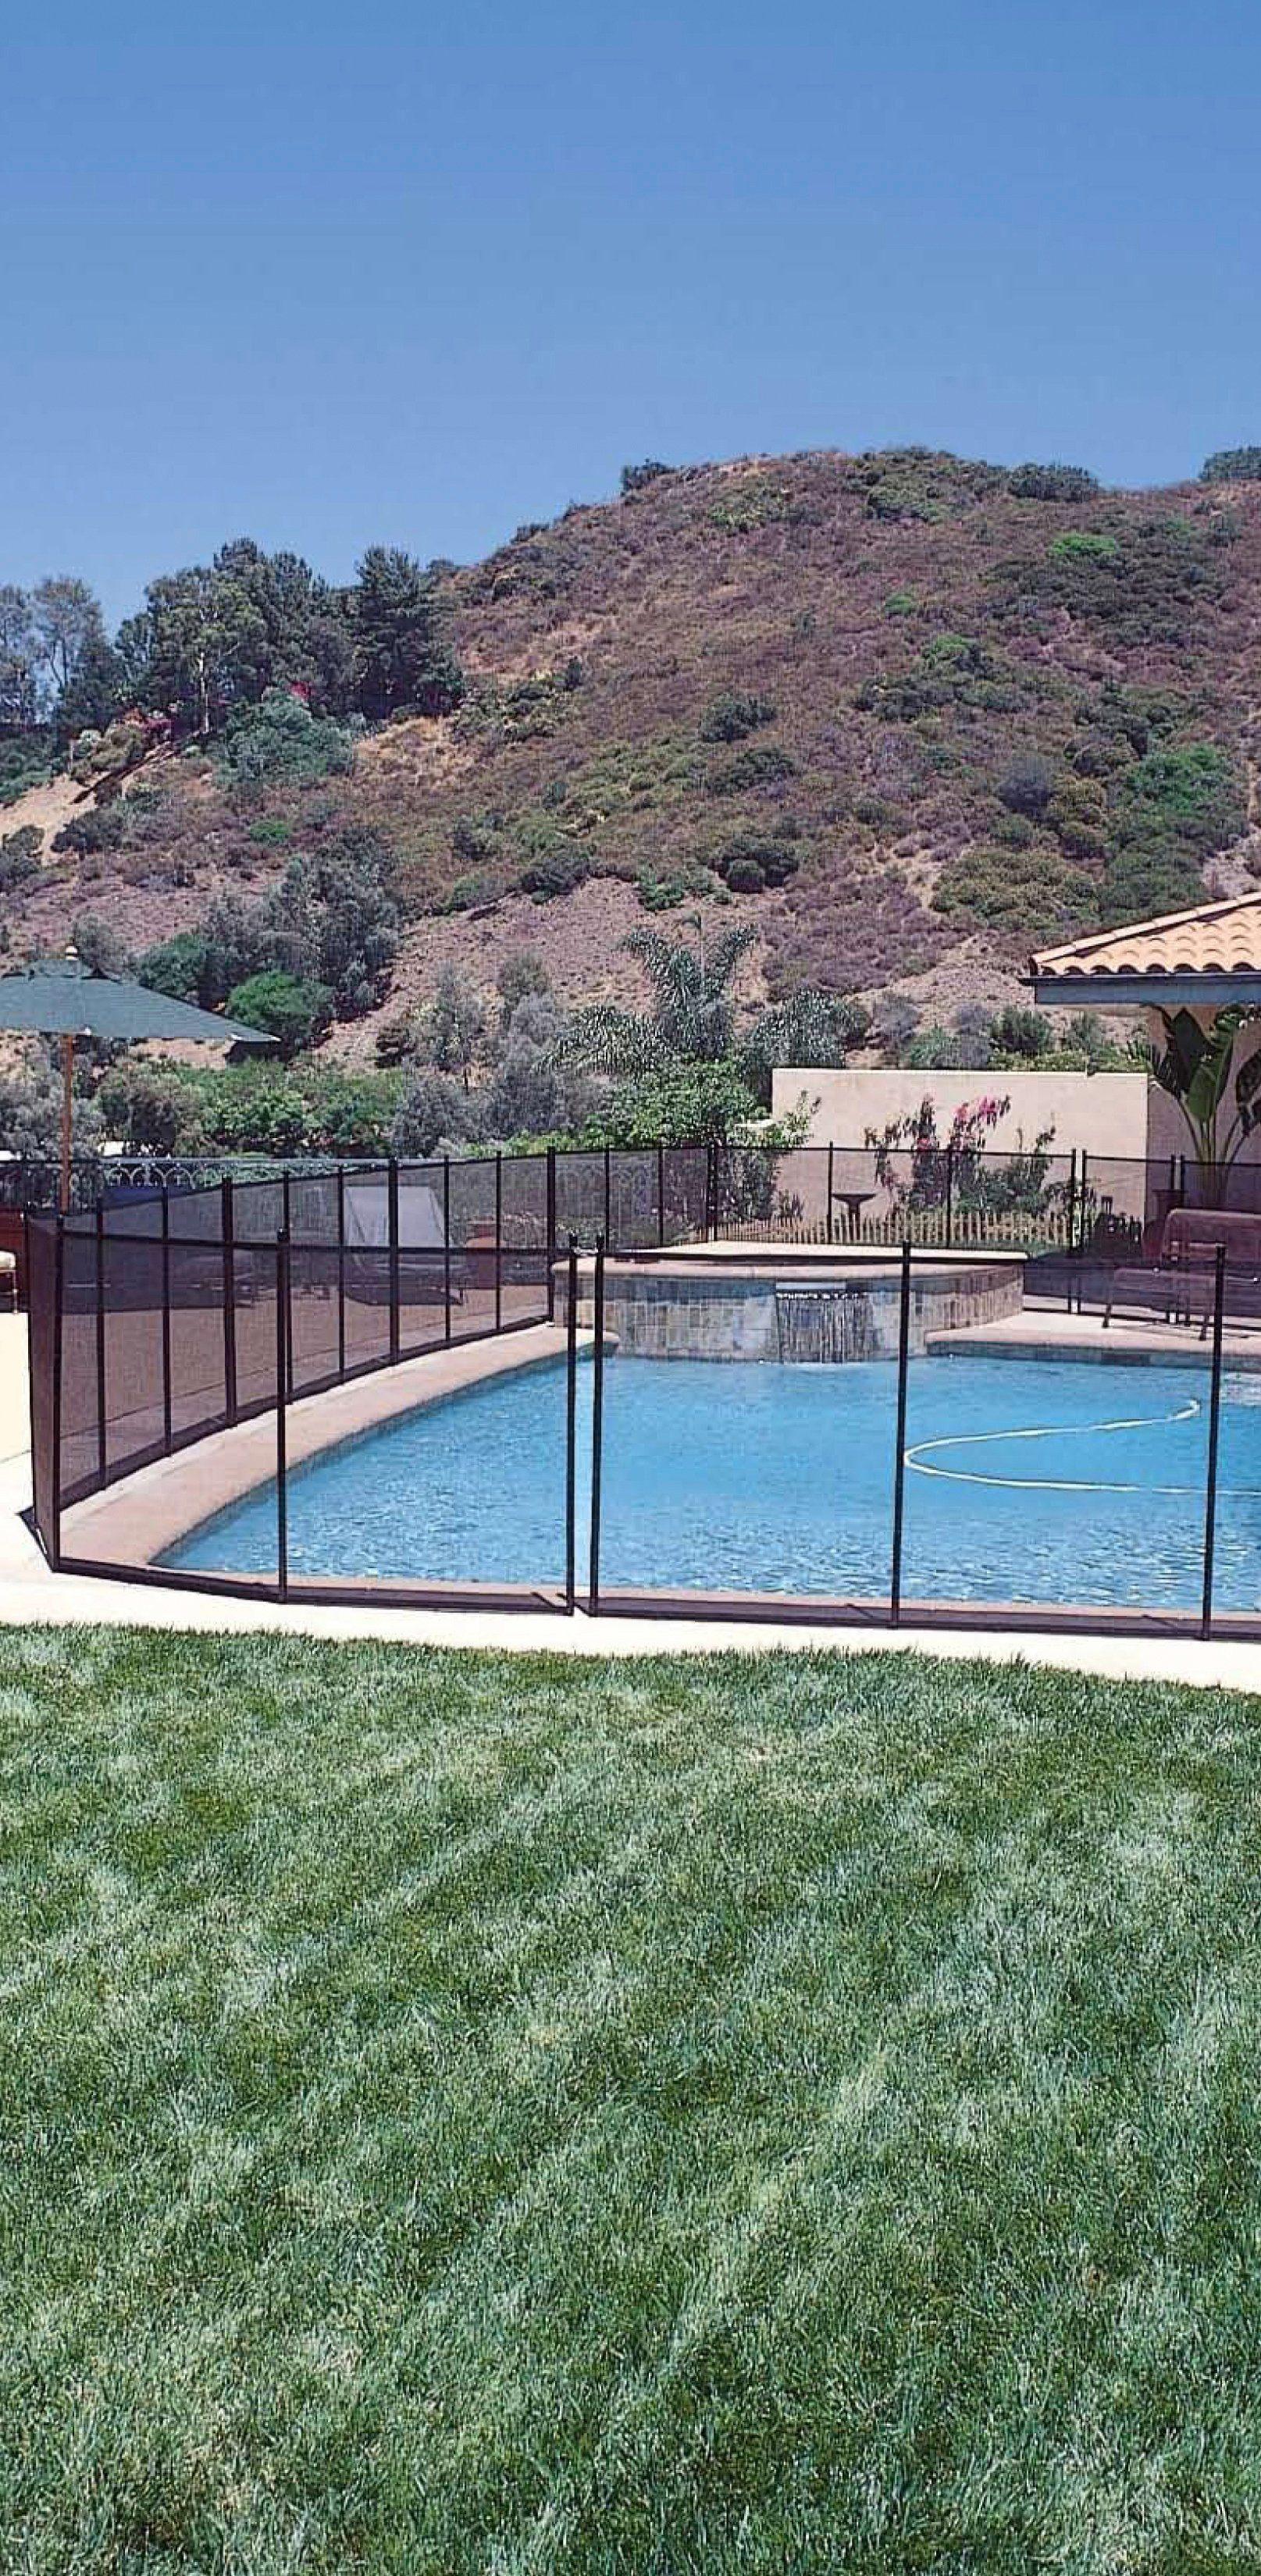 GRE Schutzgitter , für Pools, 1 Paneel LxH: 366x128 cm